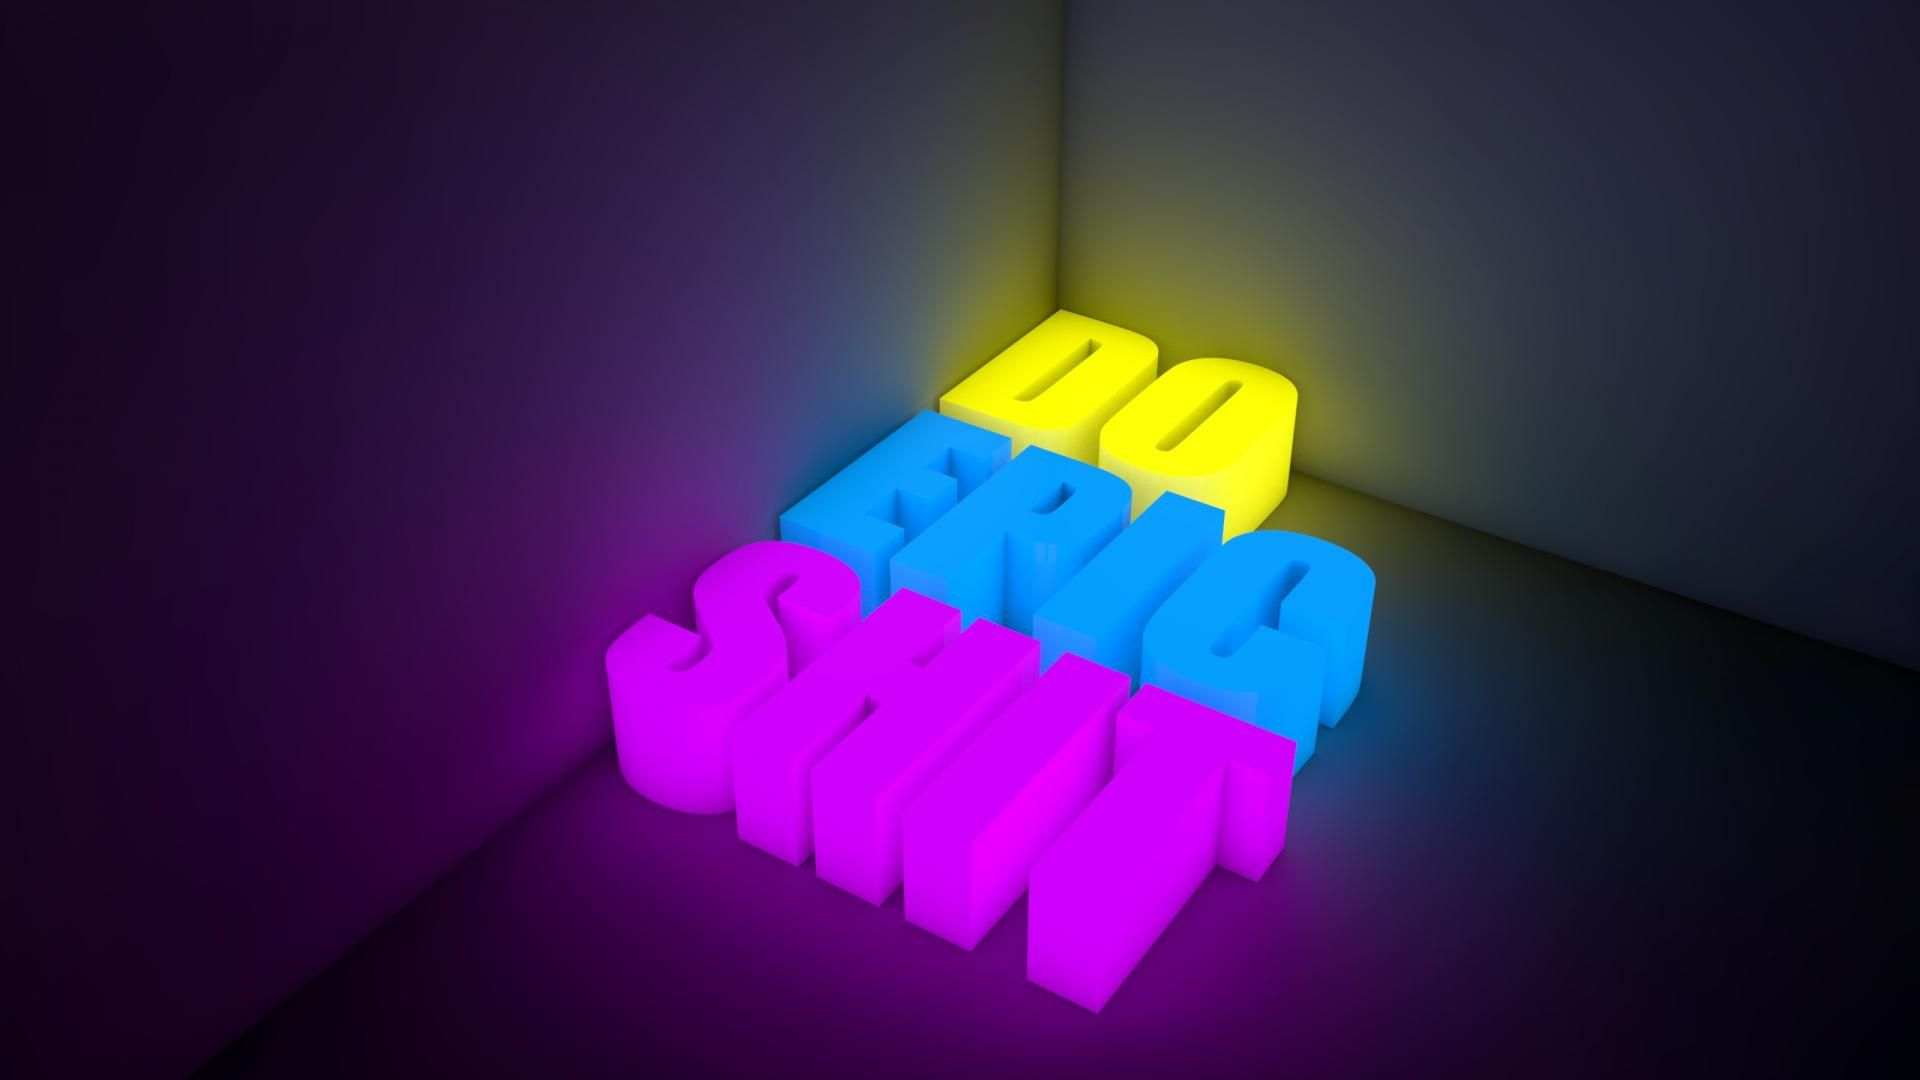 neon screensavers pictures